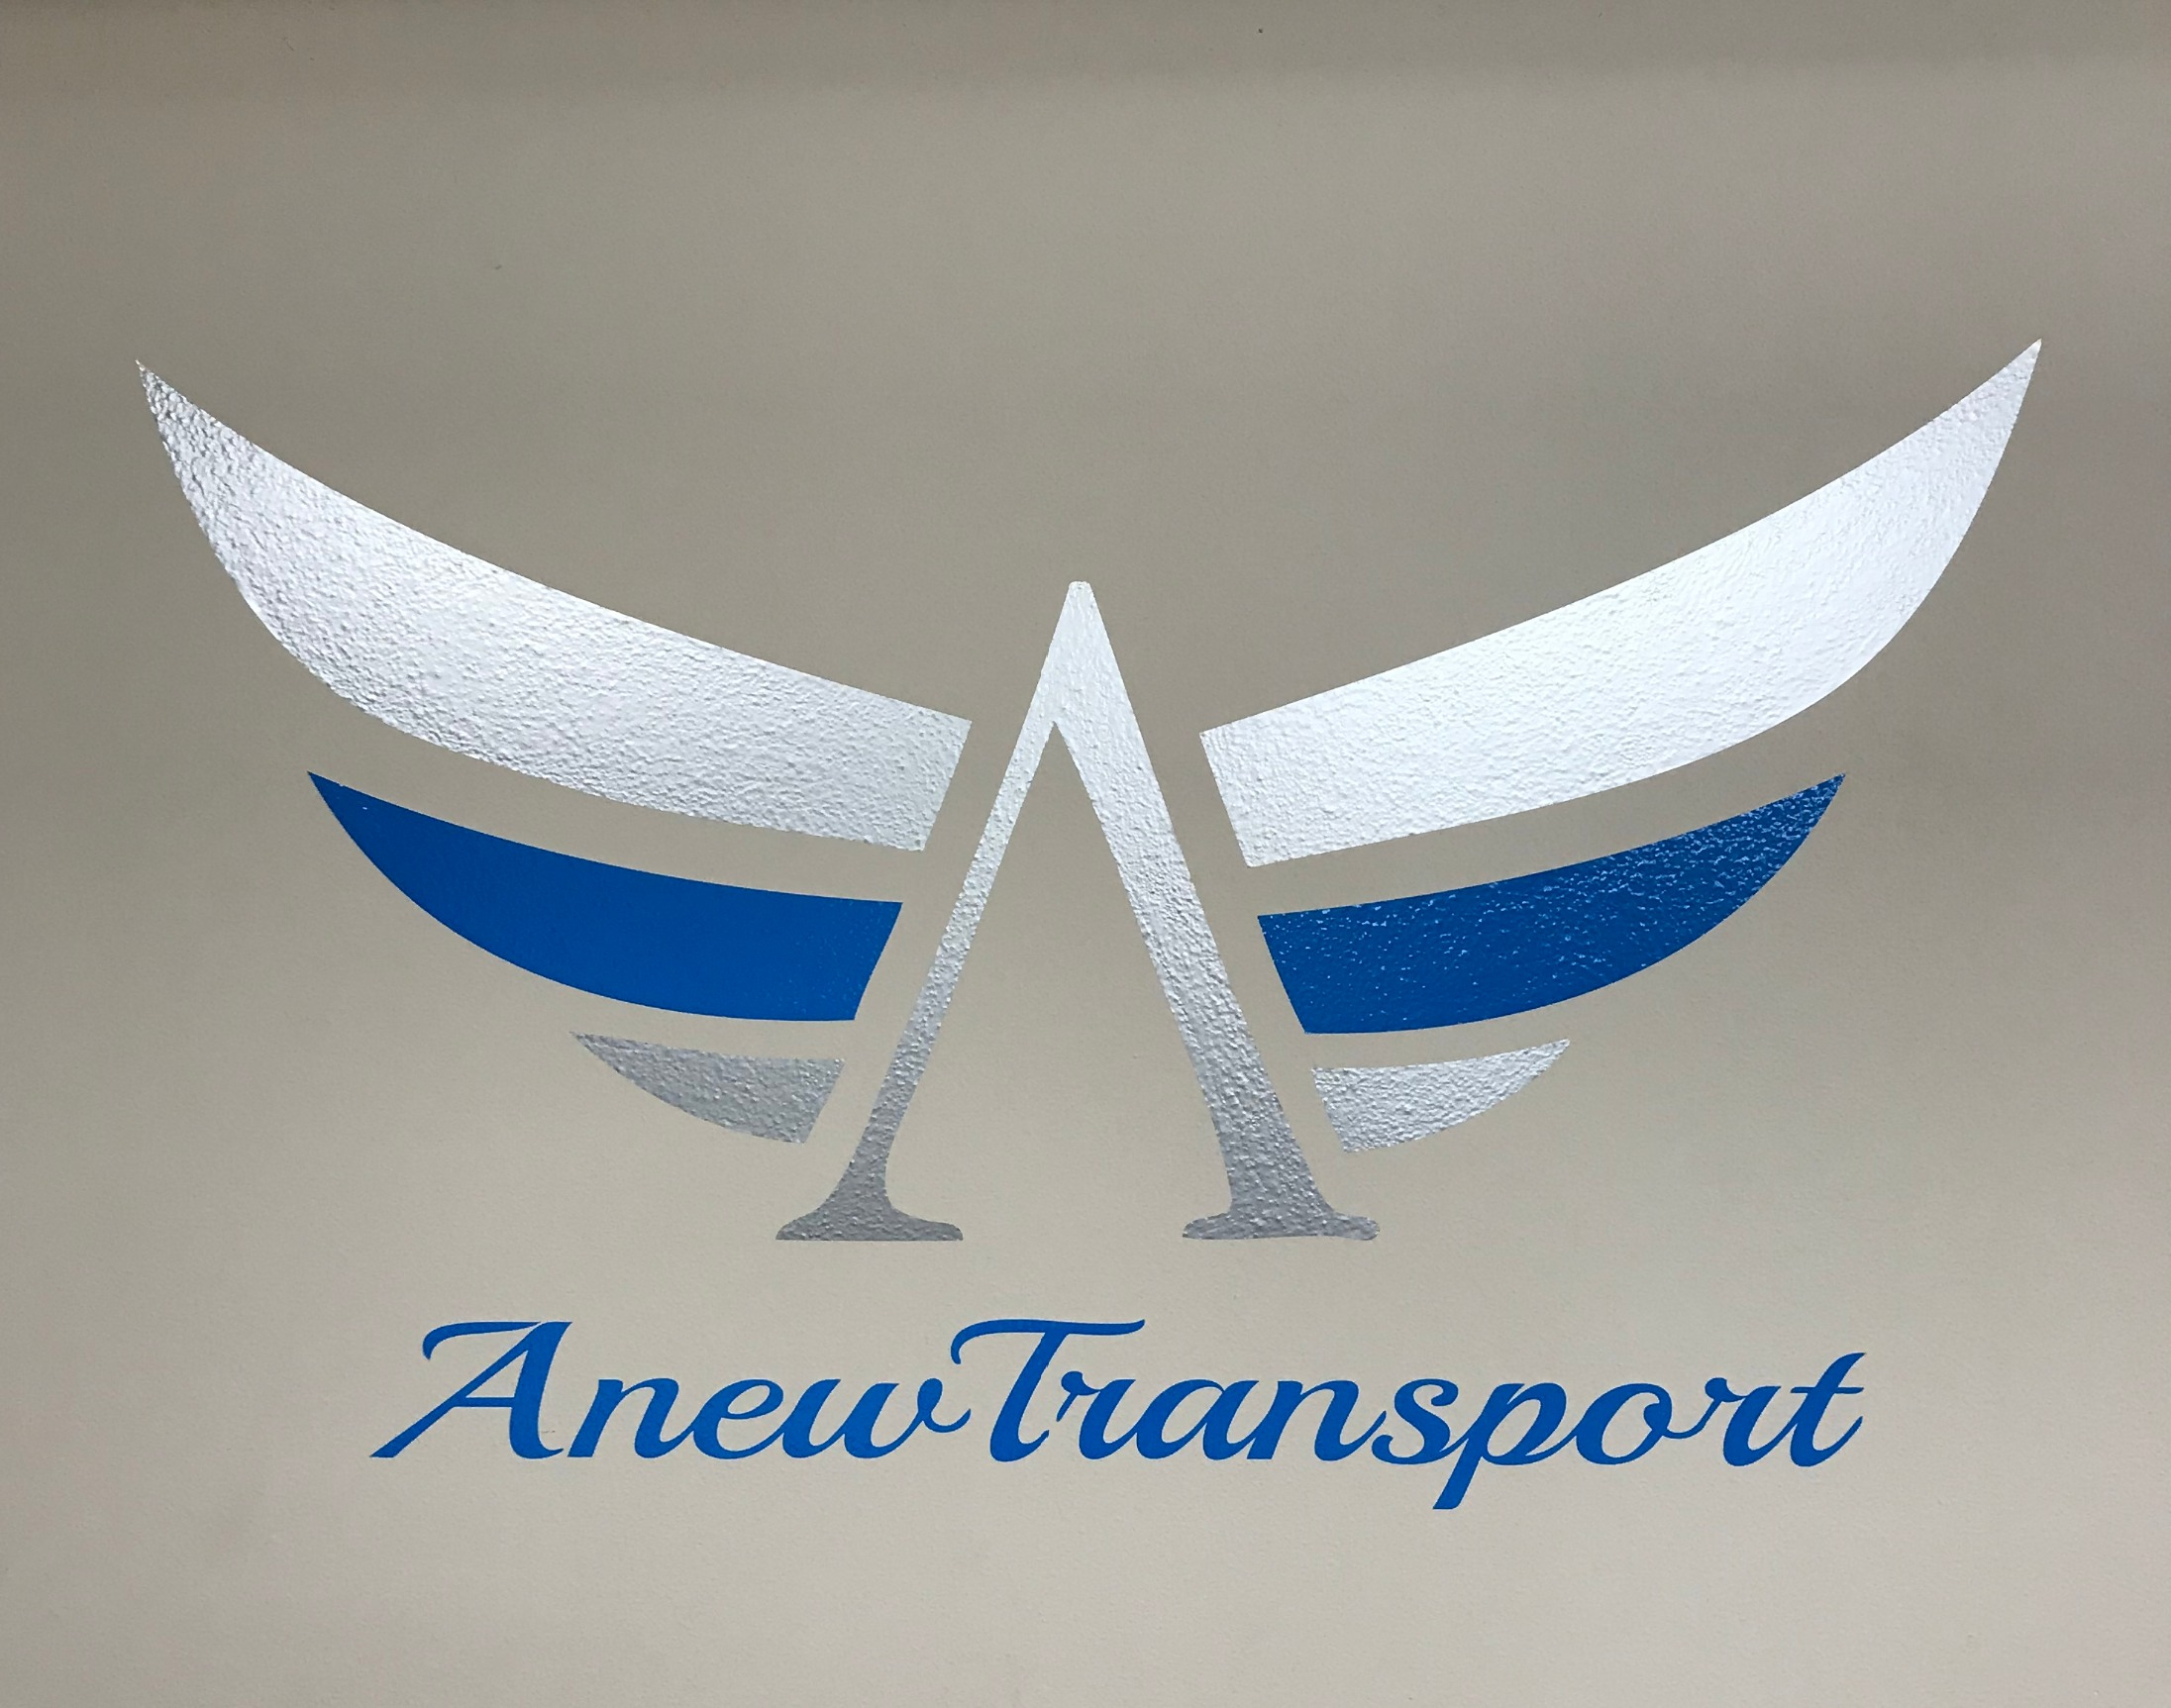 Anew Transport_edited